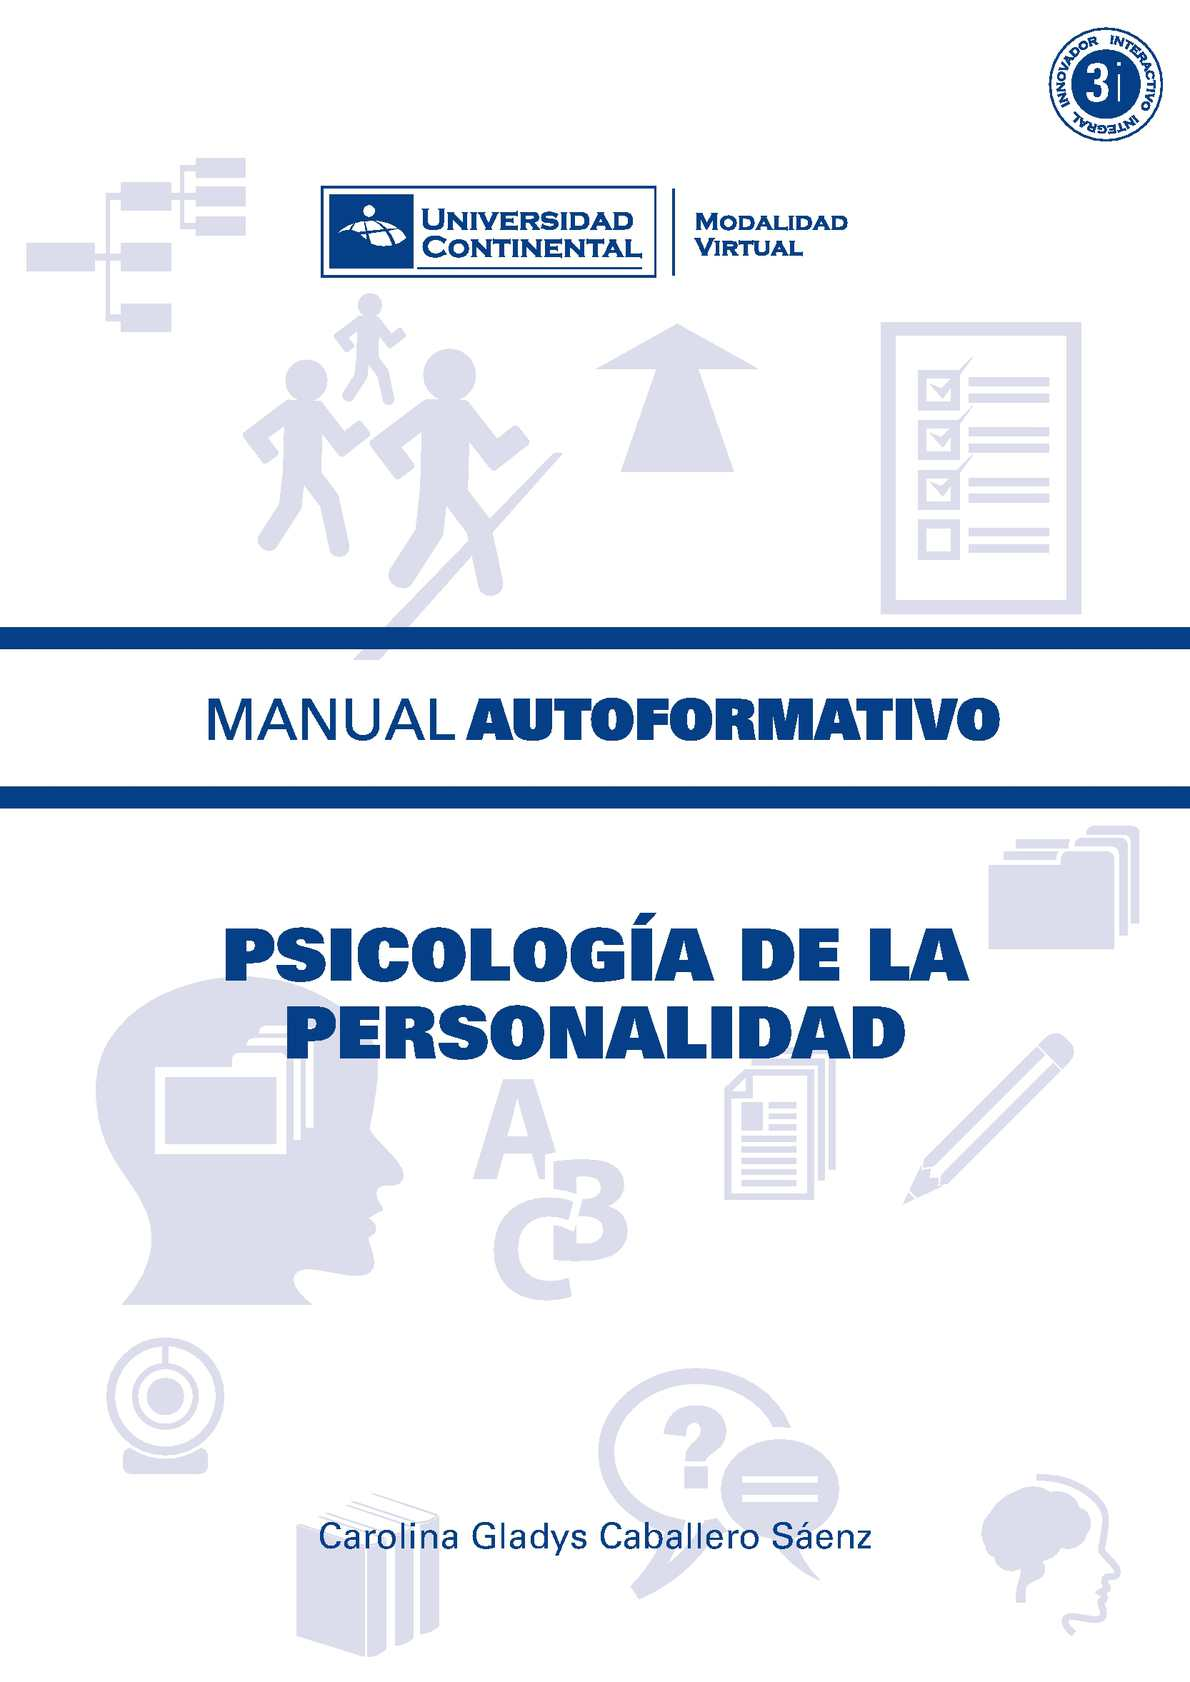 Calaméo - A0387 MA Psicologia De La Personalidad ED1 V1 2014